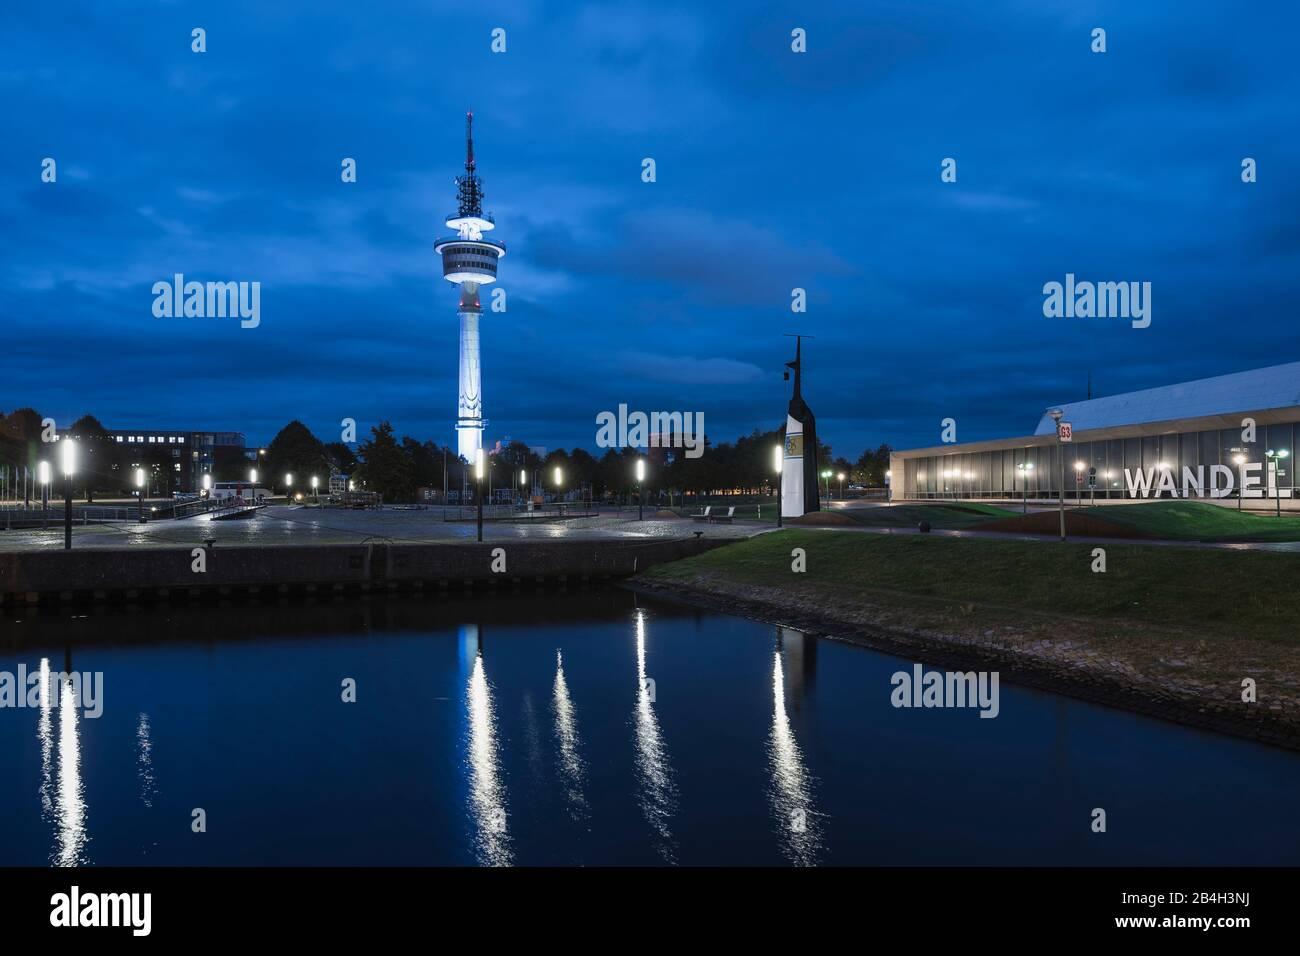 Hans Scharoun Square at night, Richtfunkturm, German Maritime Museum, Bremerhaven, Germany, Europe Stock Photo